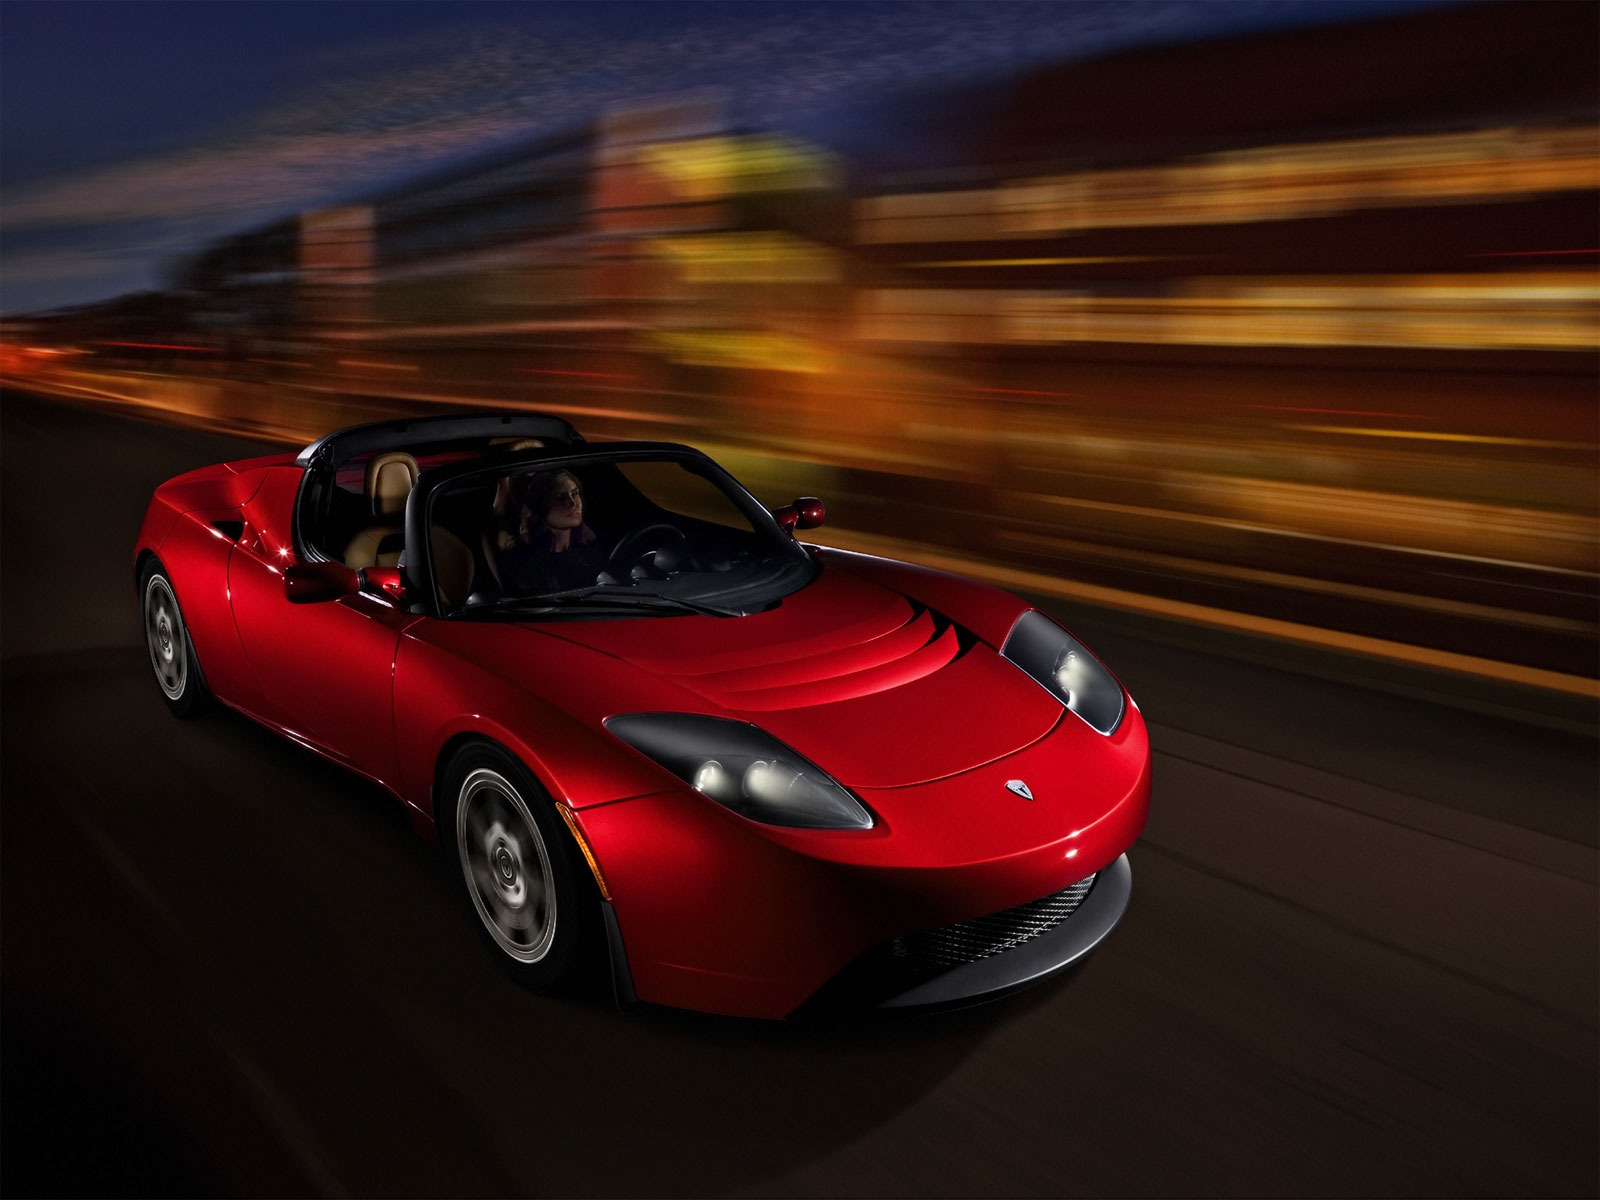 Tesla Roadster Red Wallpaper Tesla Cars Wallpapers In Jpg